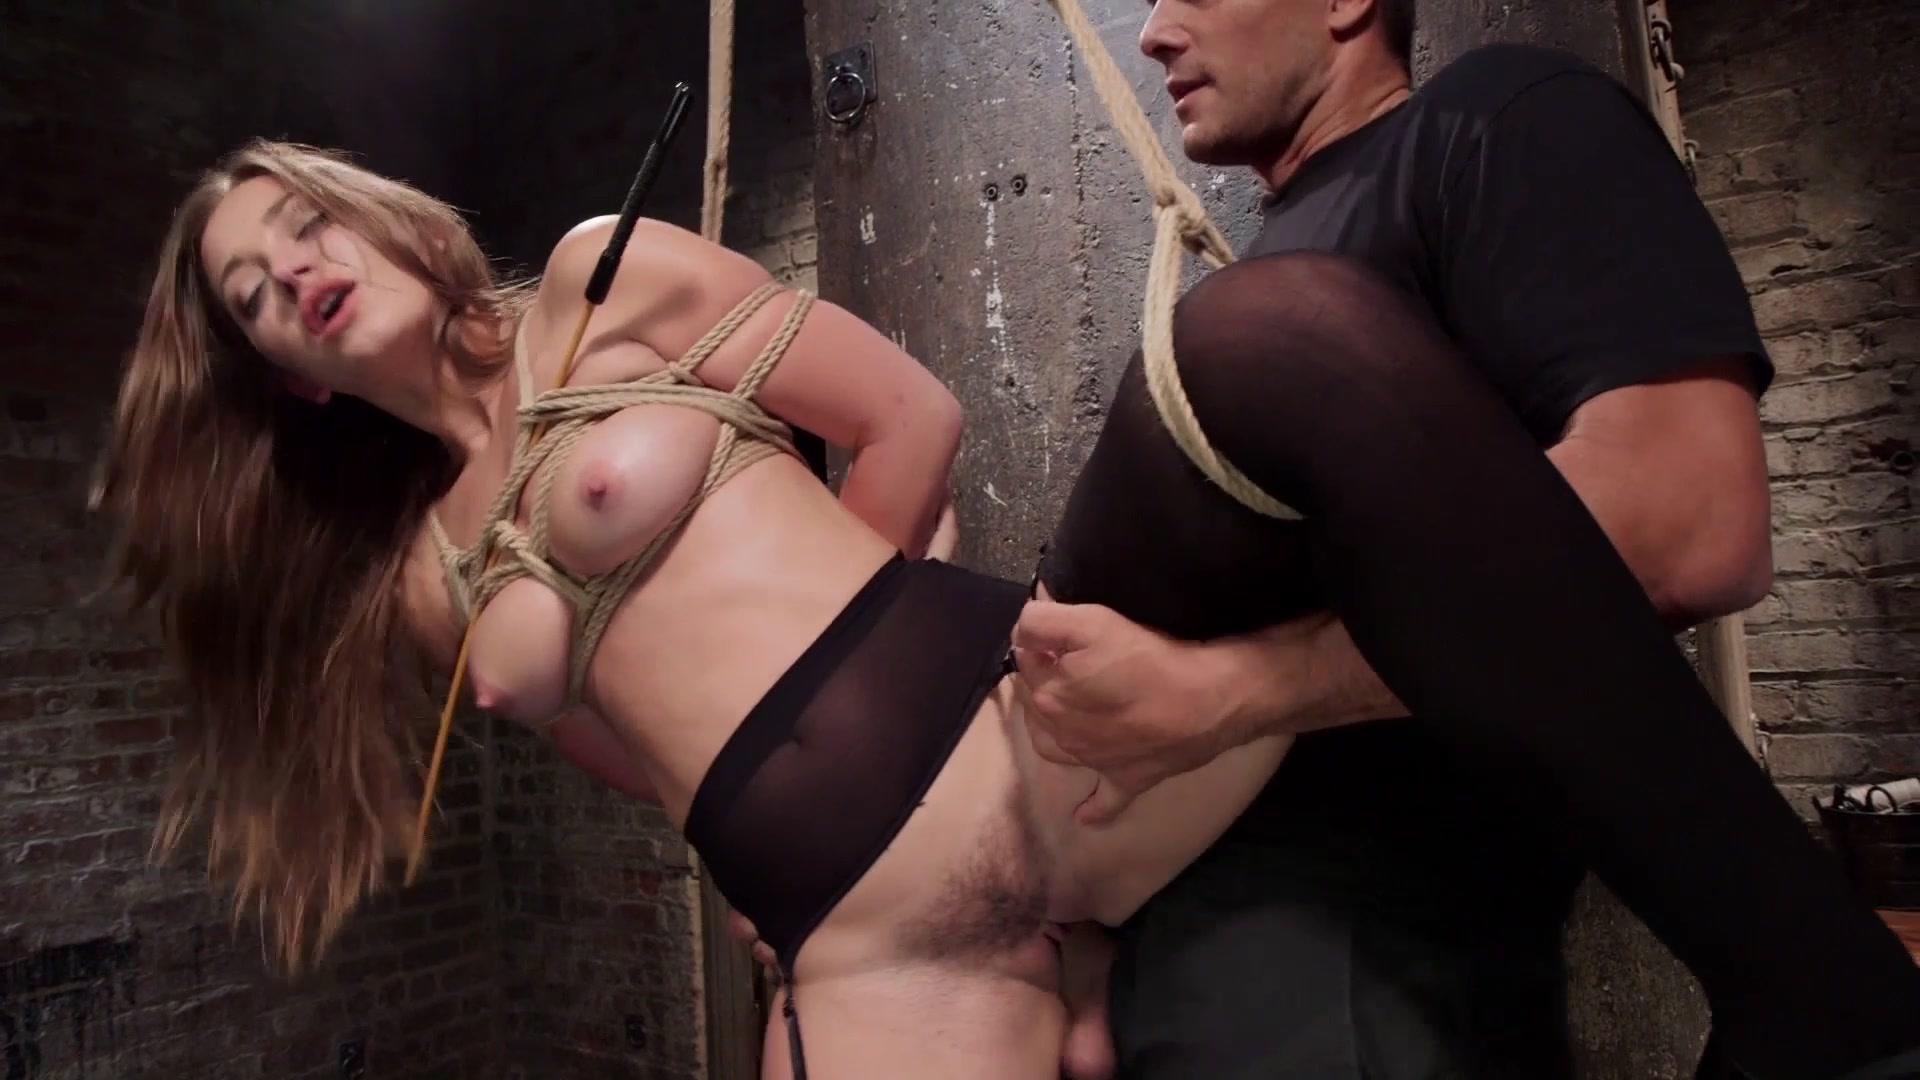 Xxx Star Renee Gracie Hot Seductive Pics